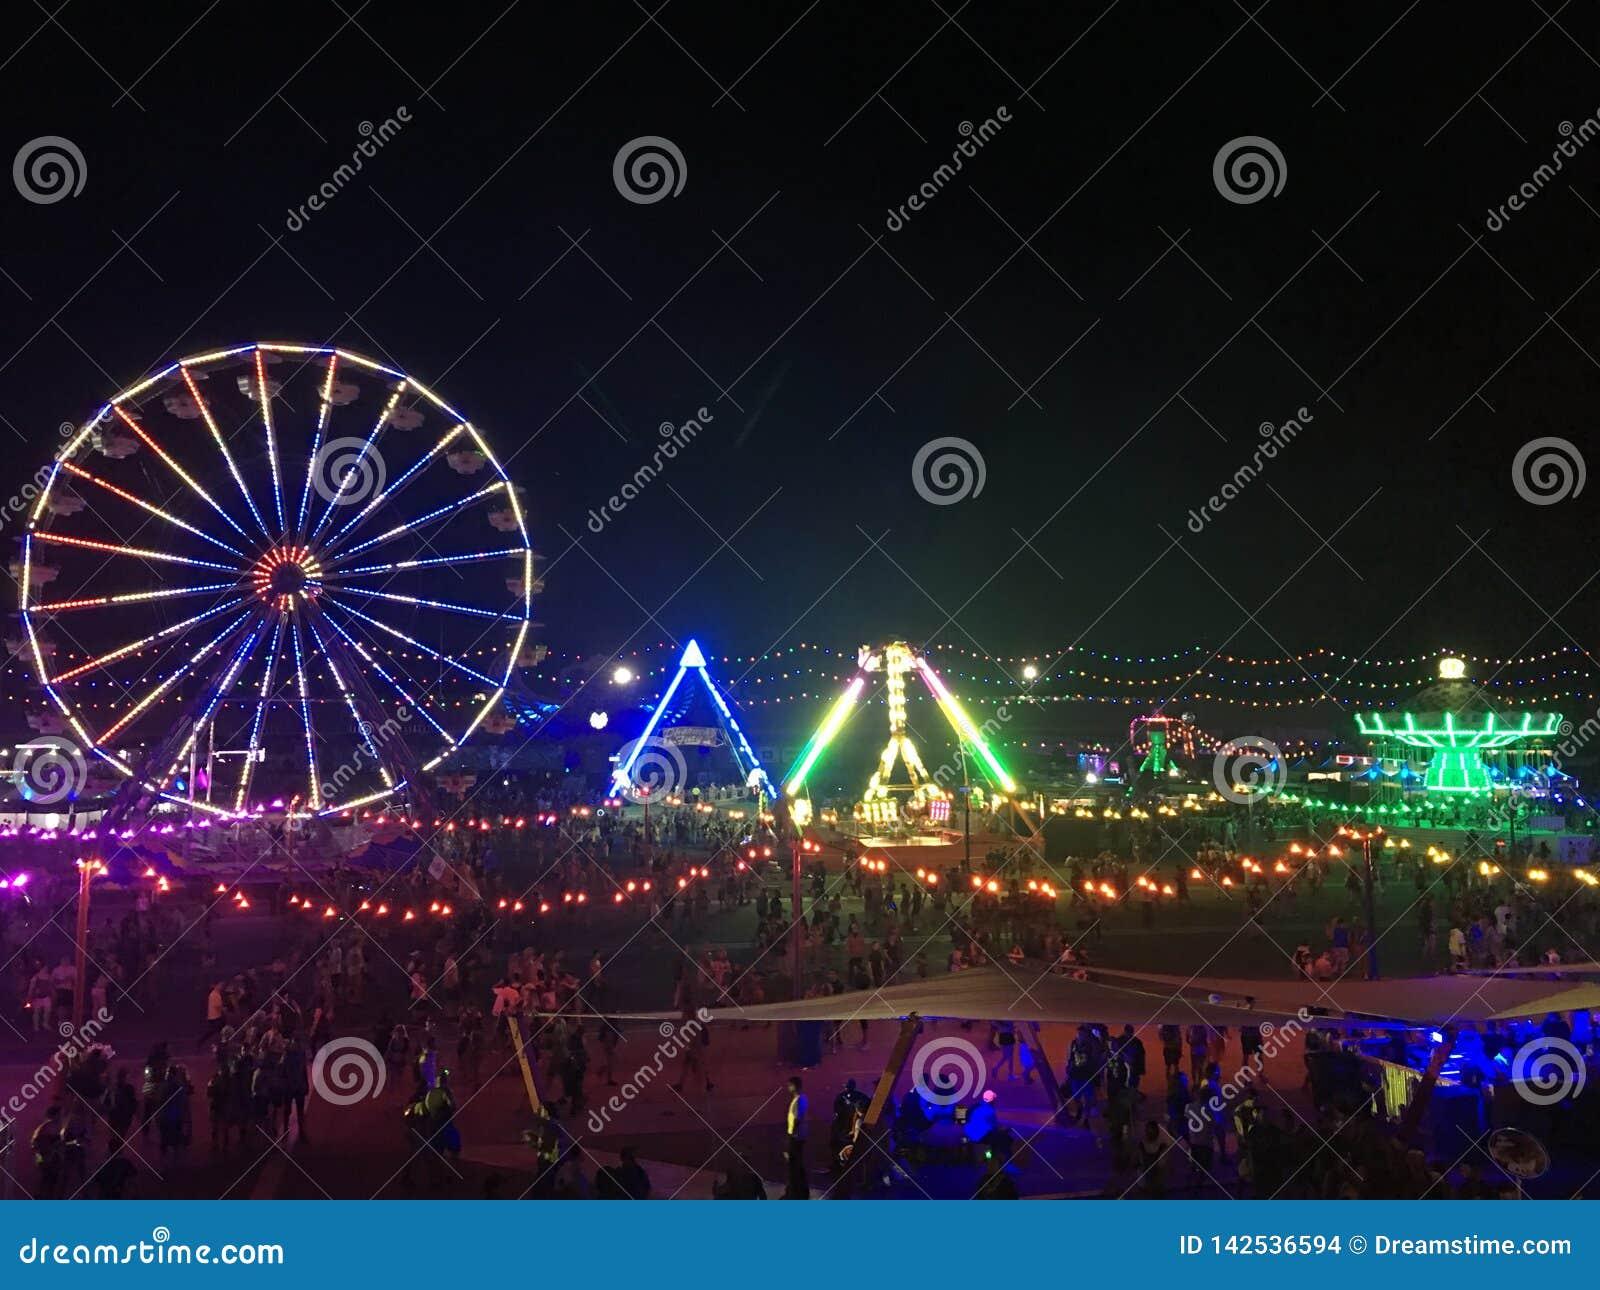 EDC Ferris Wheel